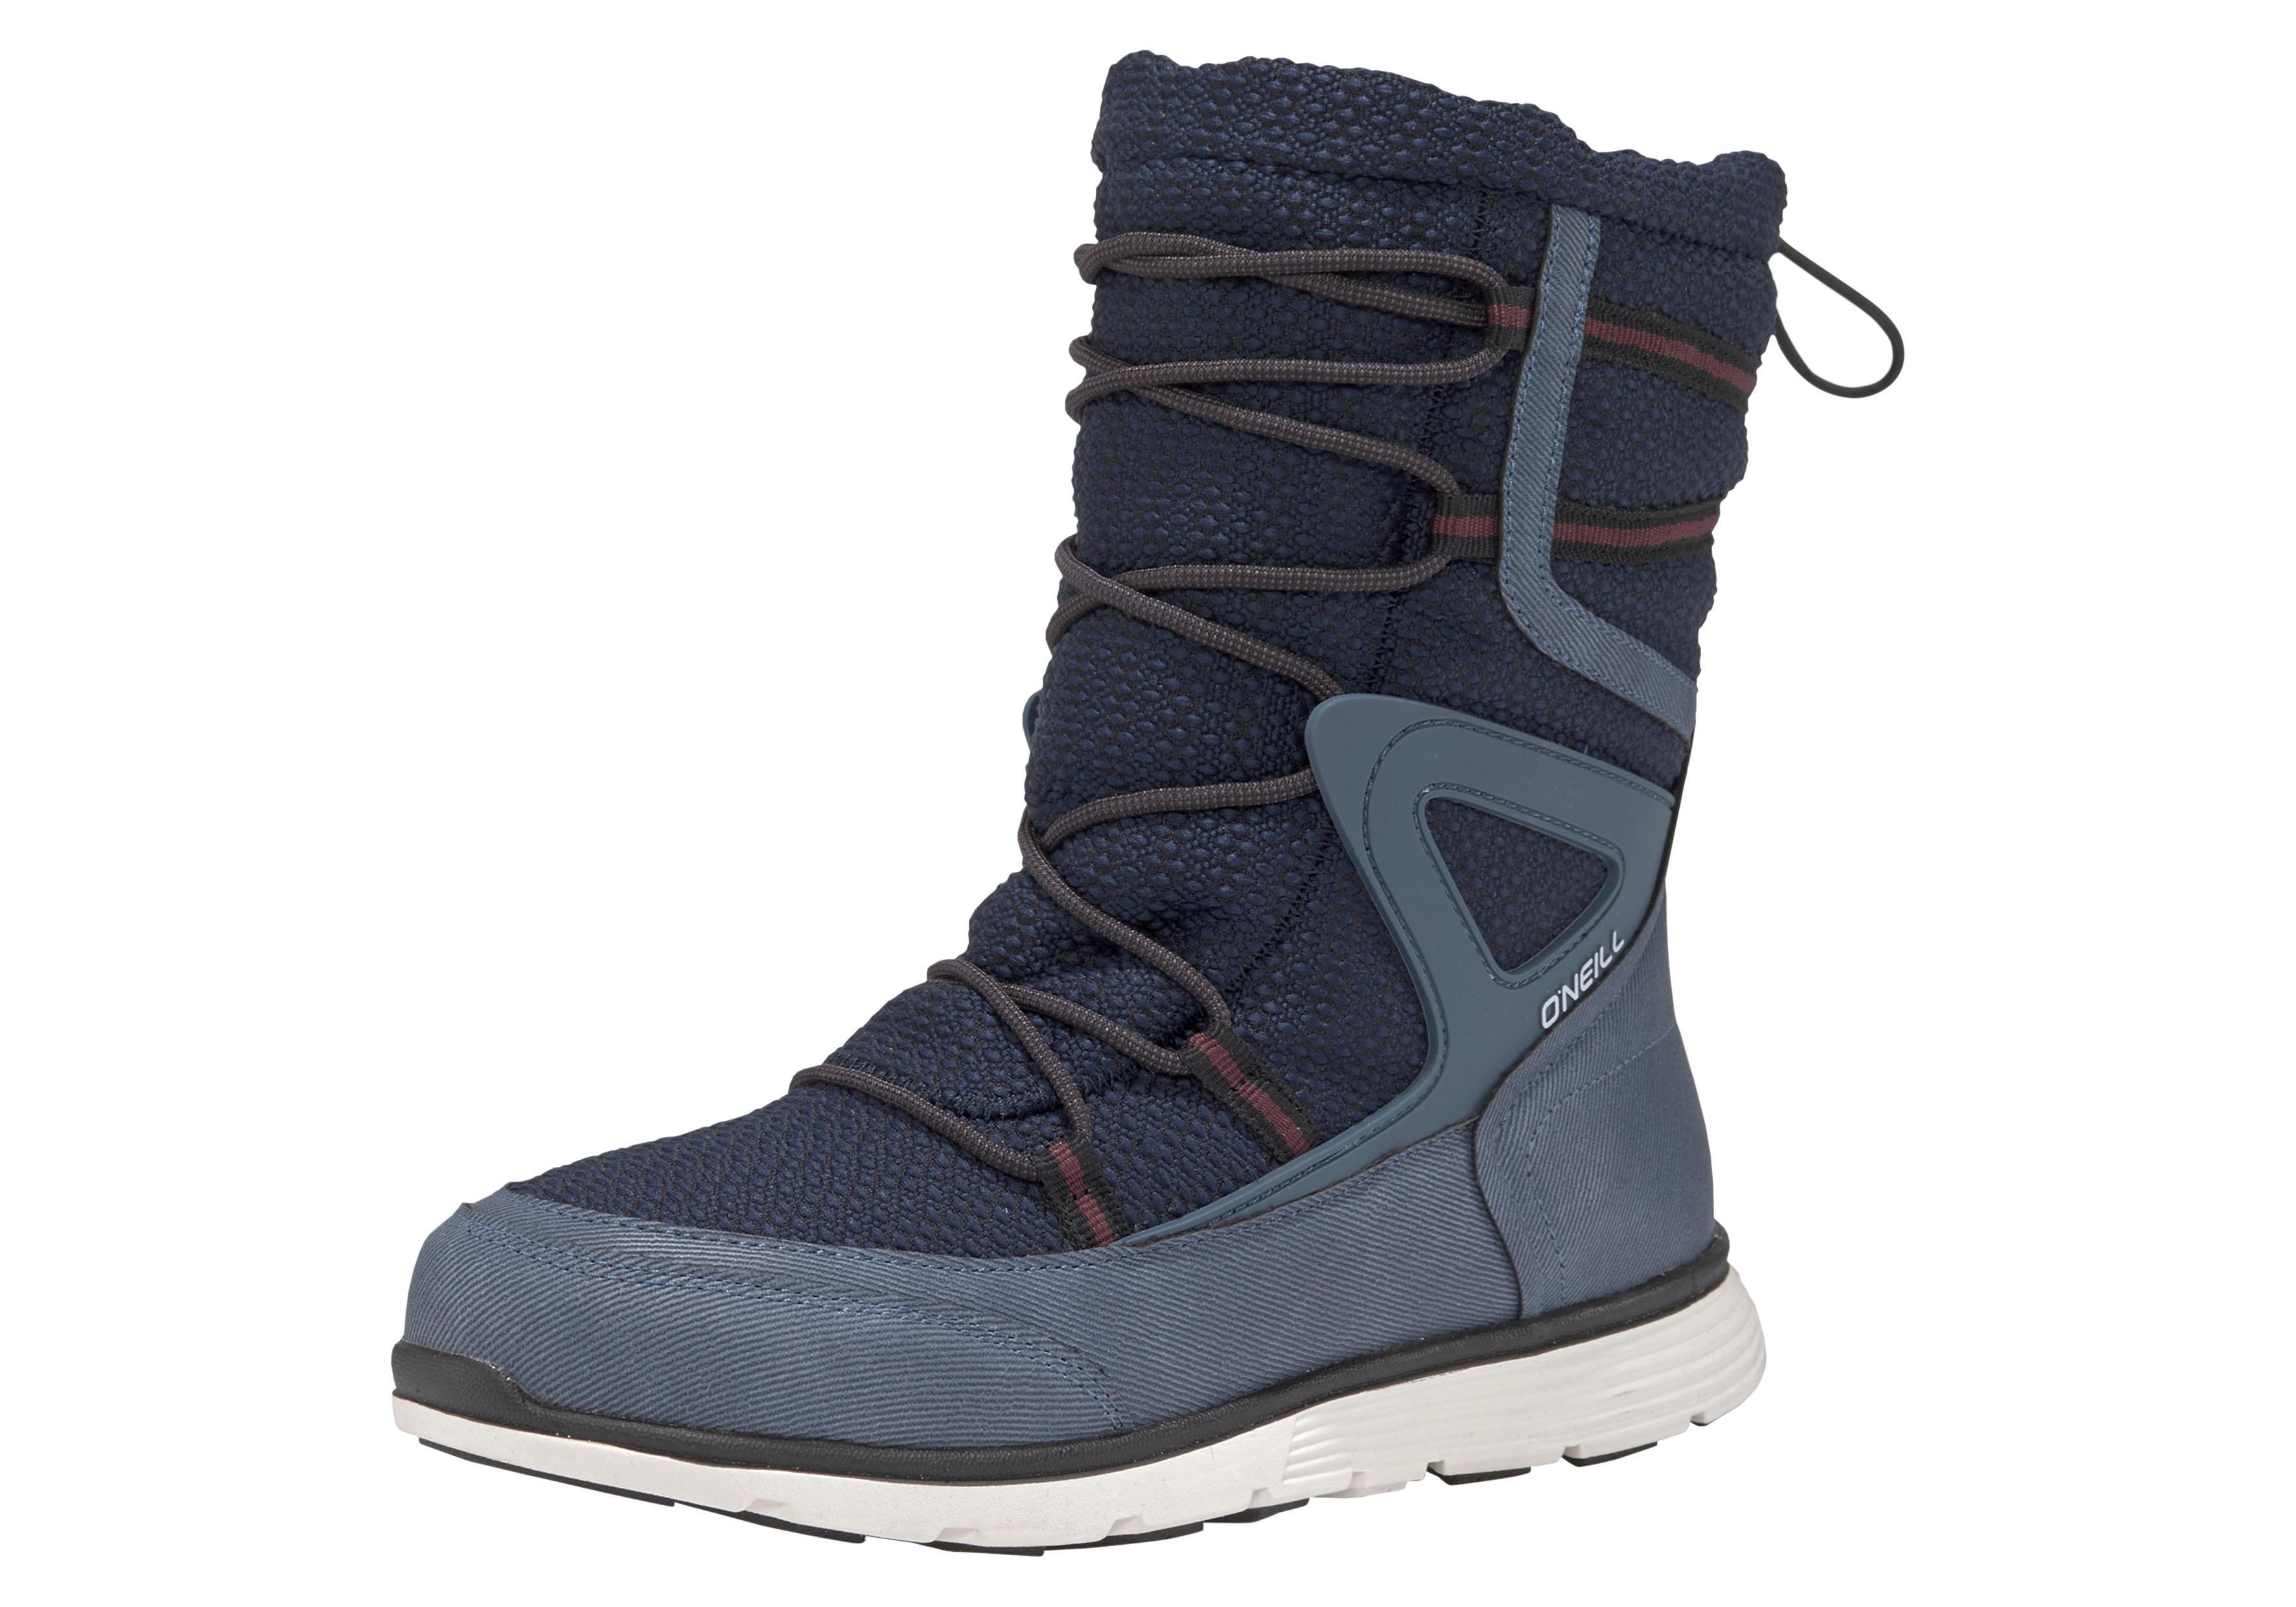 O'Neill Outdoorwinterstiefel Glacier LT | Schuhe > Outdoorschuhe > Outdoorwinterstiefel | O'Neill